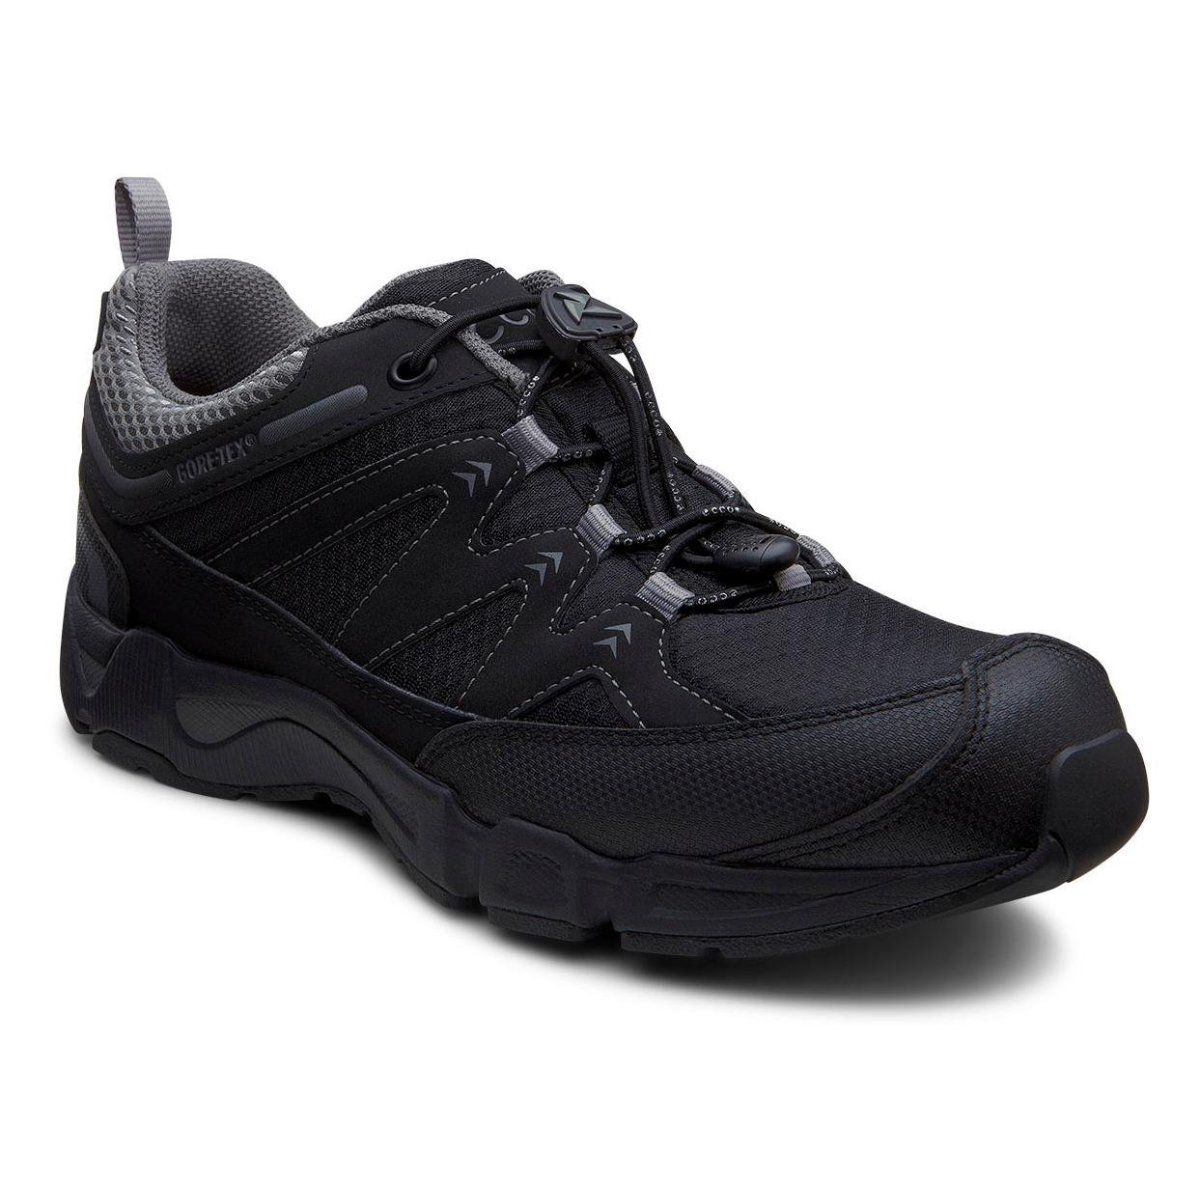 ECCO Ultra Terrain 1.1 schwarz | Schuhe Online Kaufen Onlineshop